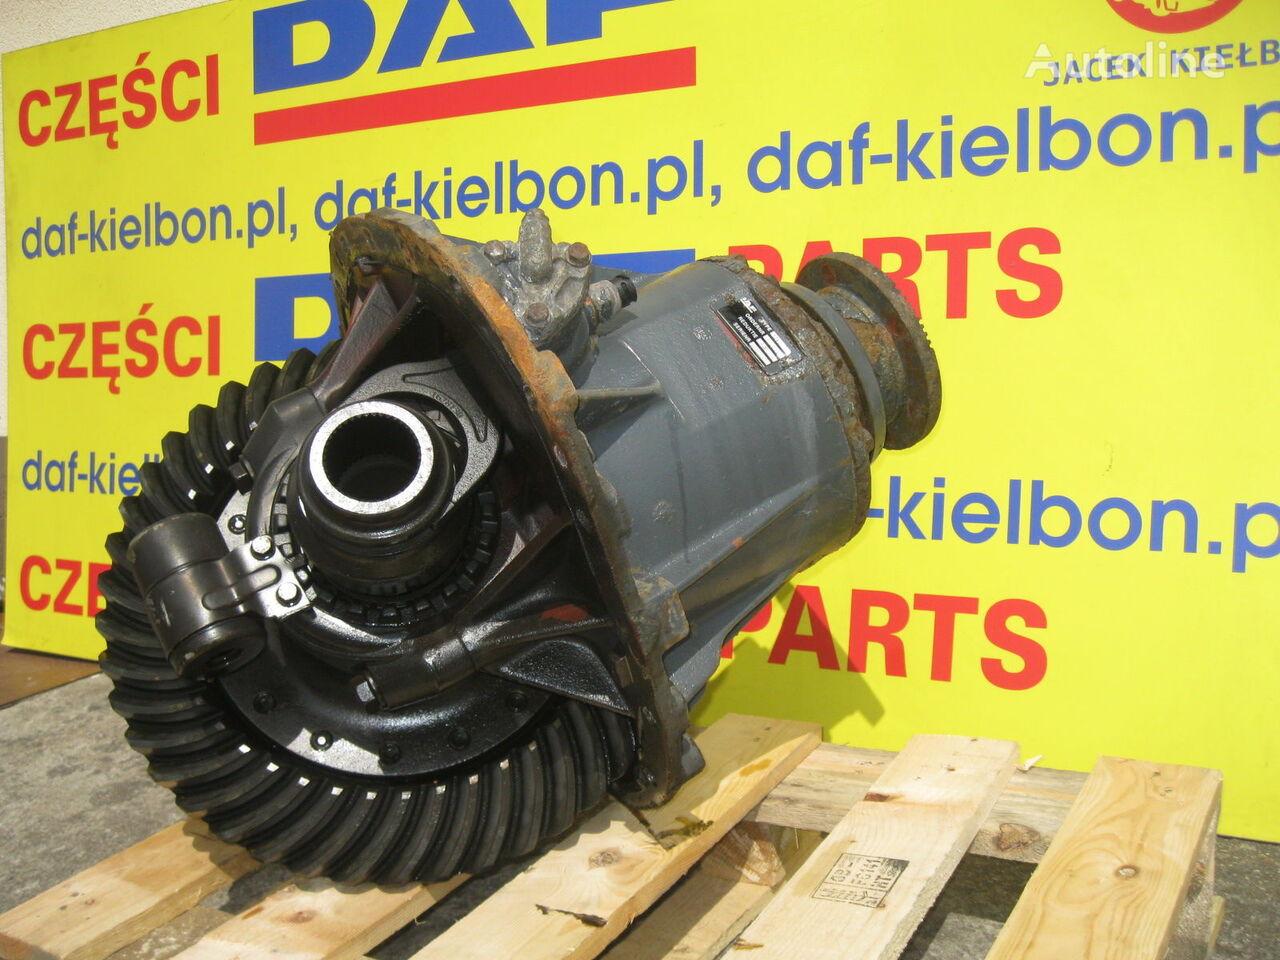 DAF 1347 2,8 2,93 3,31 4,1 WKŁAD GŁÓWKA MOSTU differensial for DAF XF 95 105 trekkvogn